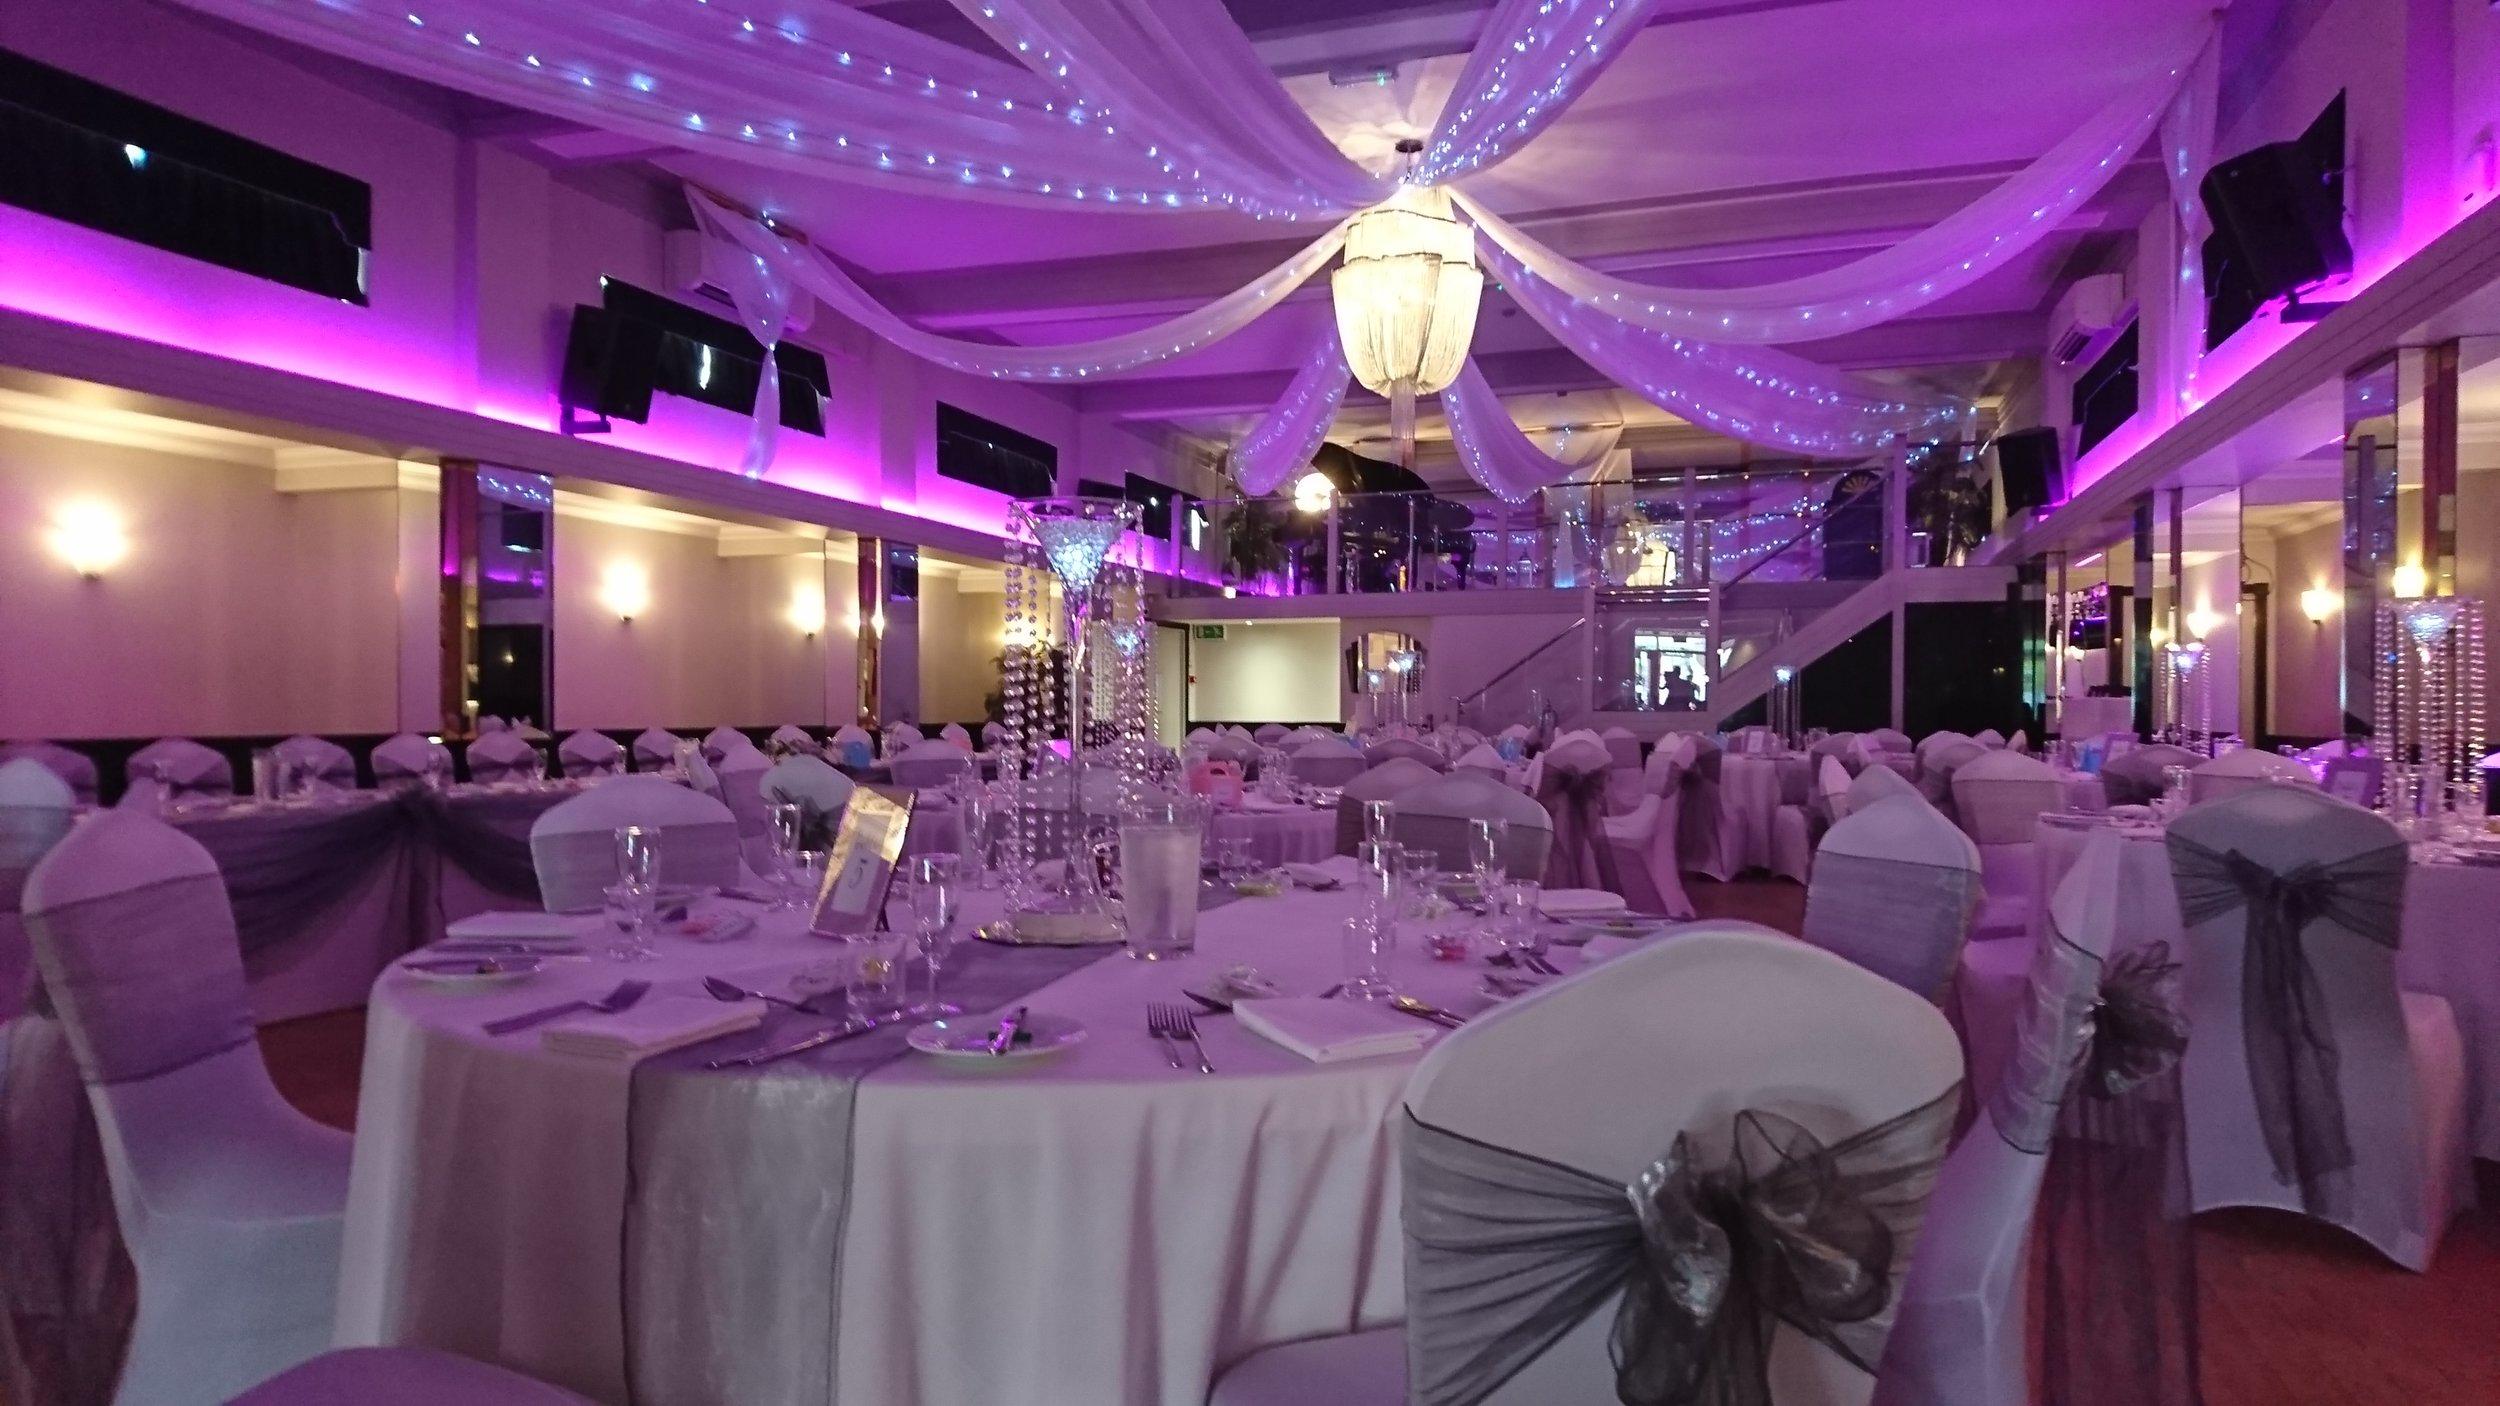 Wedding Reception - Rosie and Daniel's Wedding 24th August 2019 - Arlington Ballroom Southend